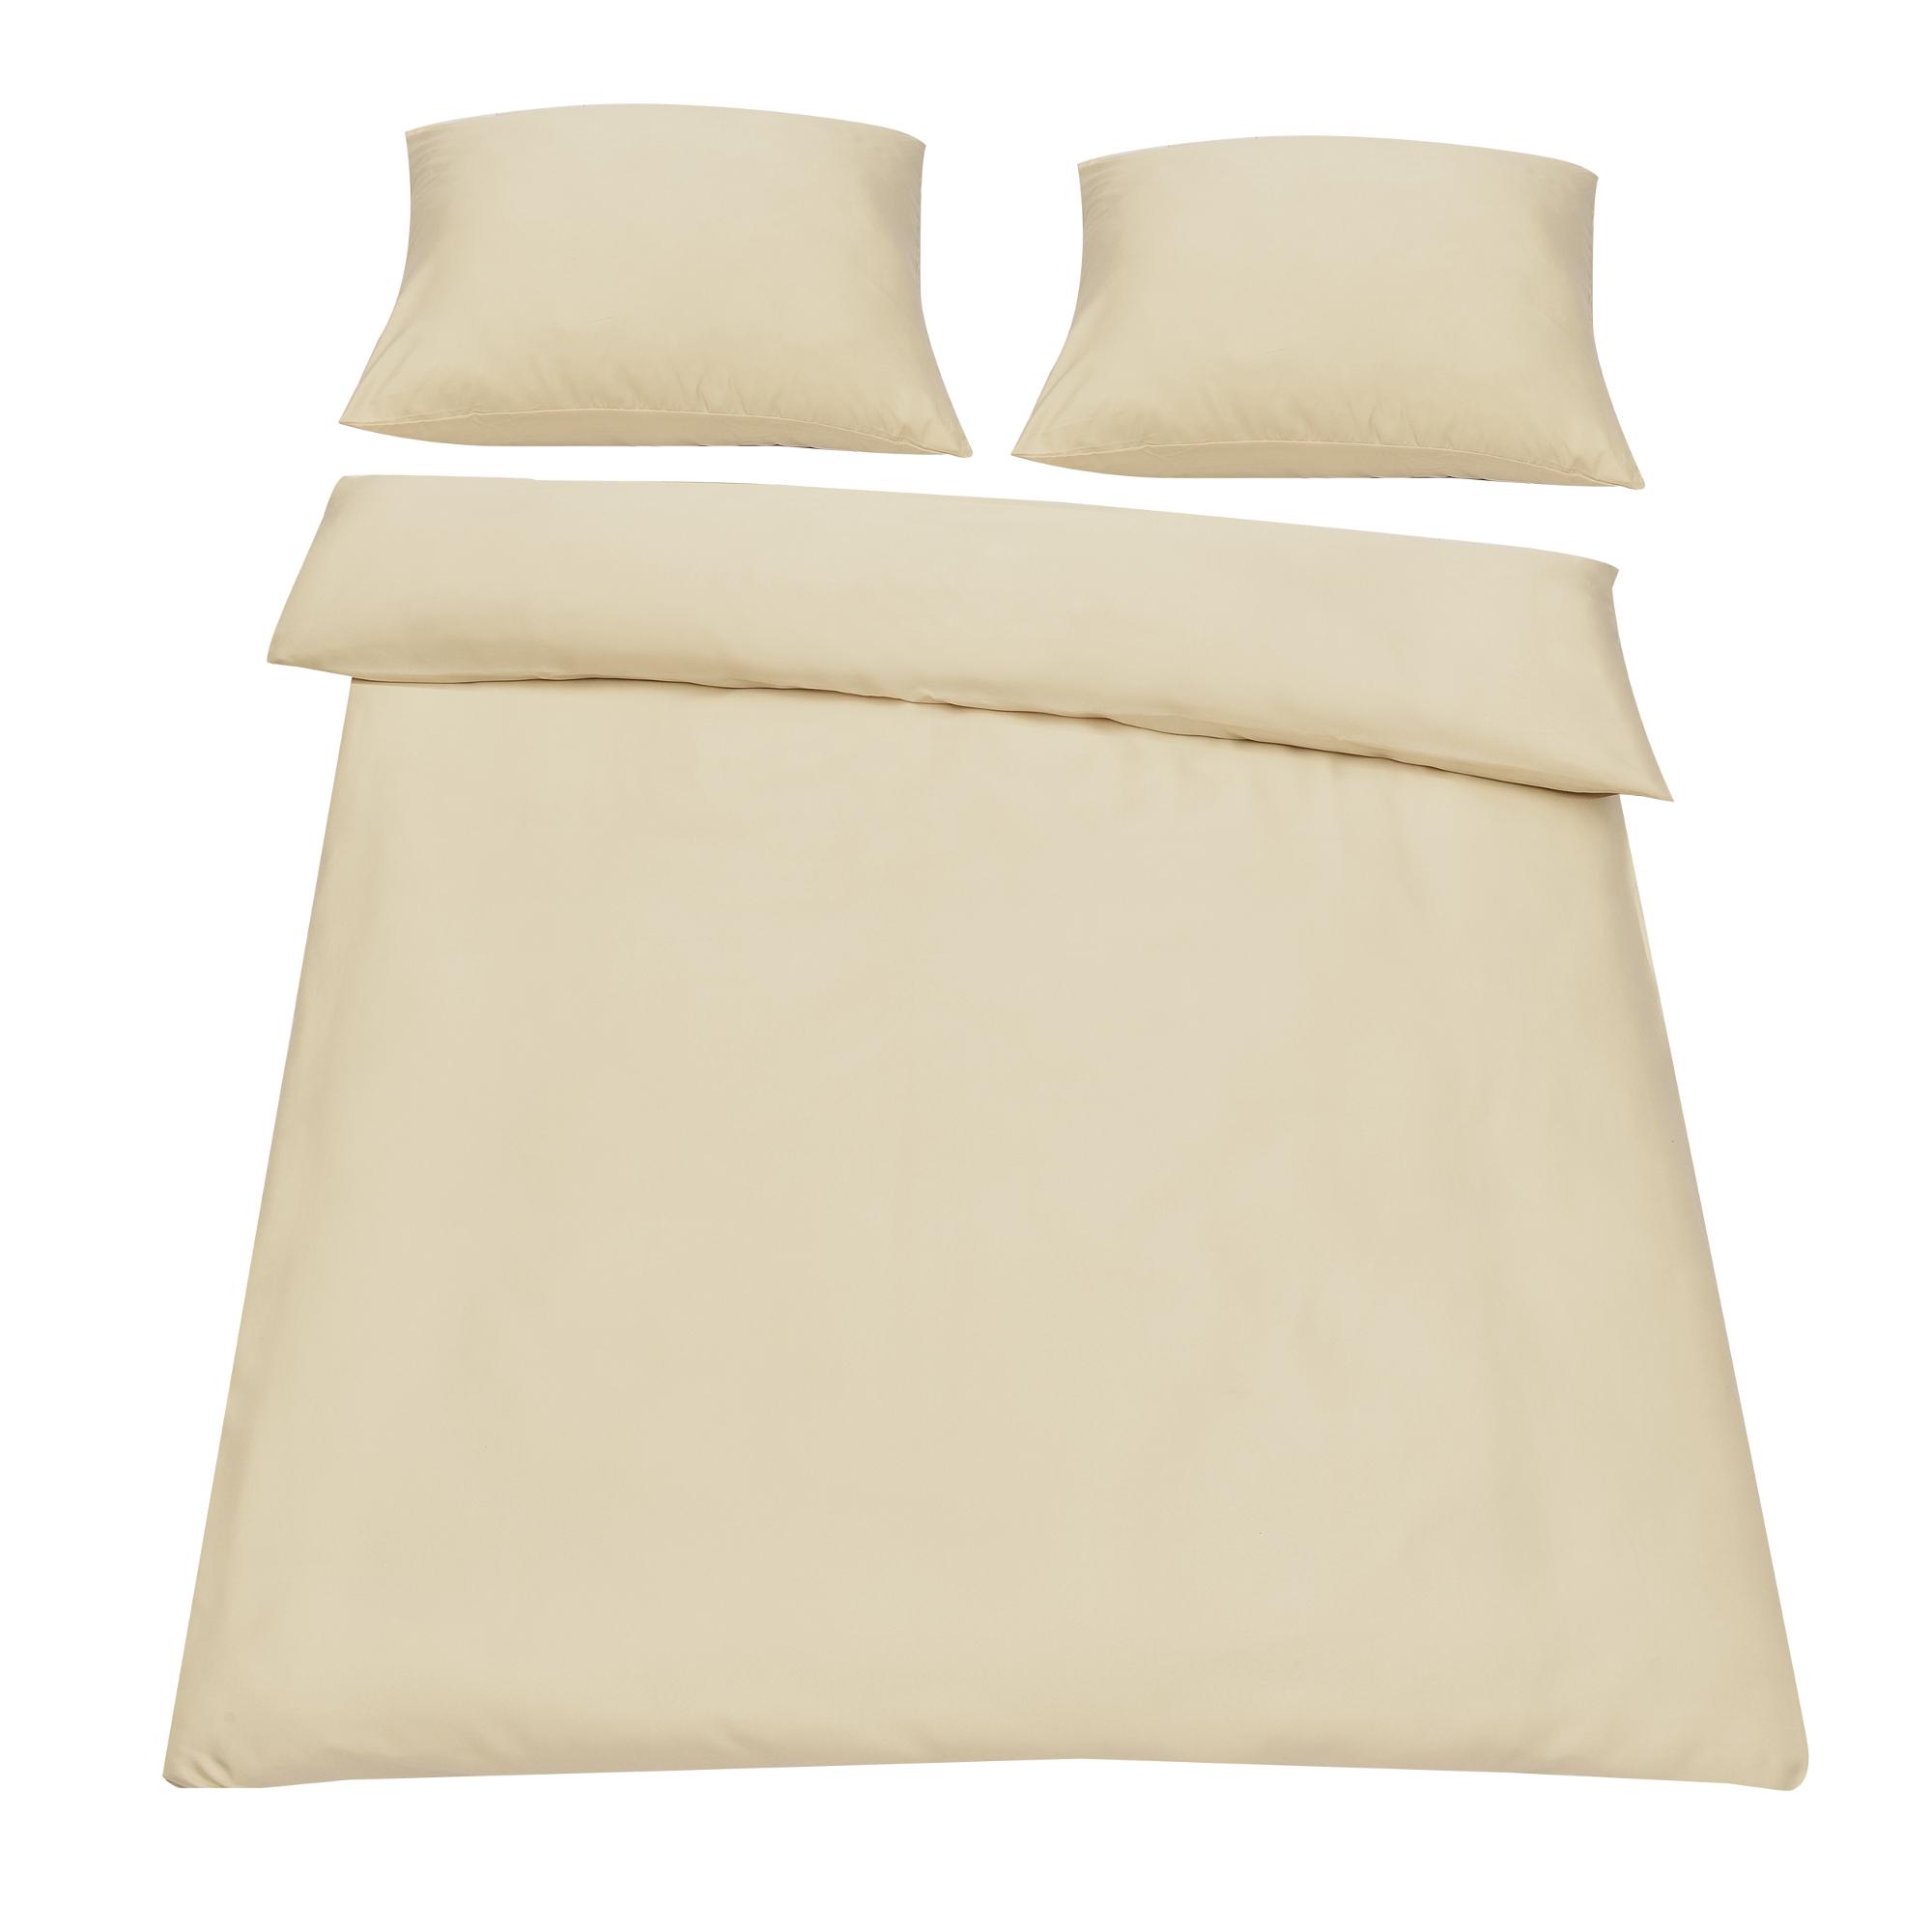 bettw sche 200x200cm beige kissenbezug. Black Bedroom Furniture Sets. Home Design Ideas